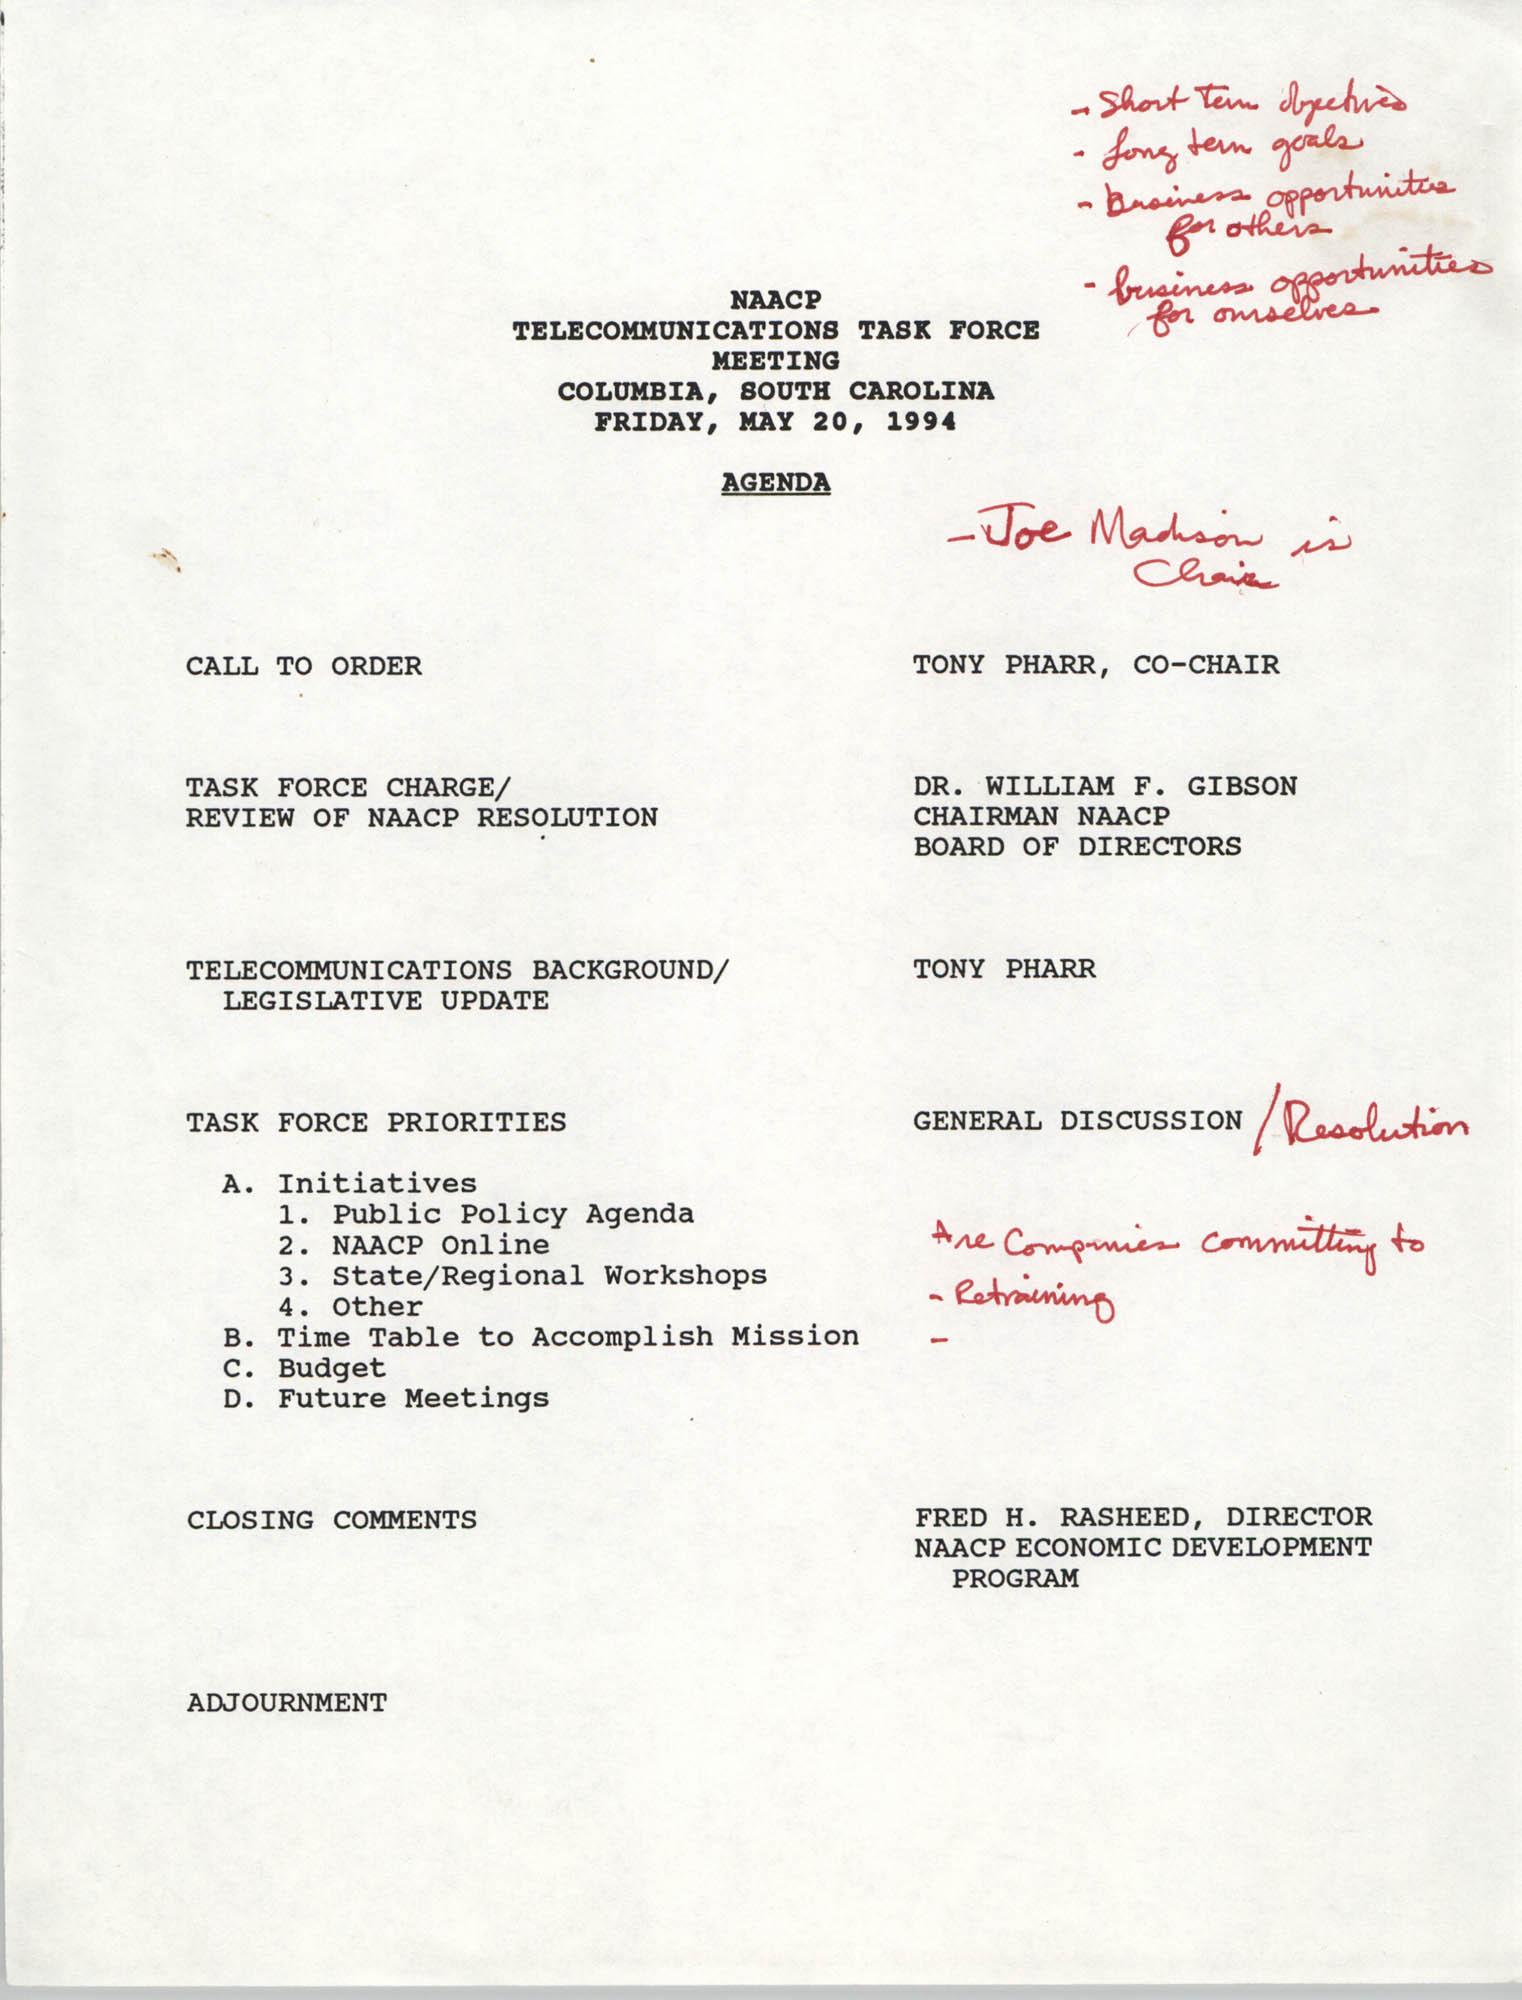 Agenda, Telecommunications Task Force Meeting, NAACP,  May 20, 1994